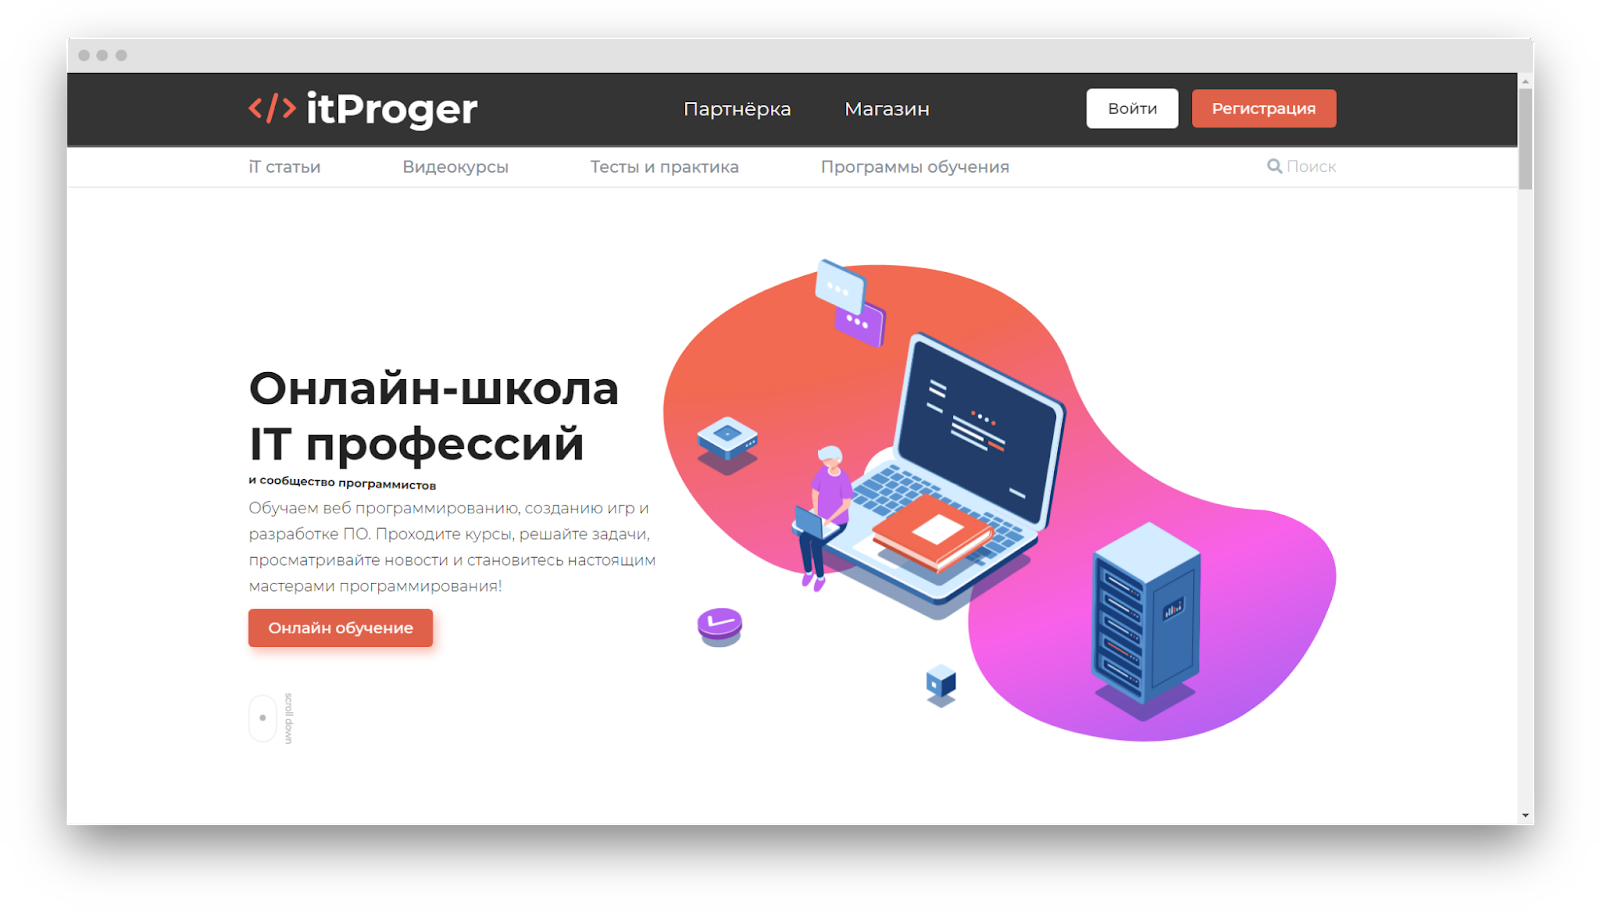 ItProger